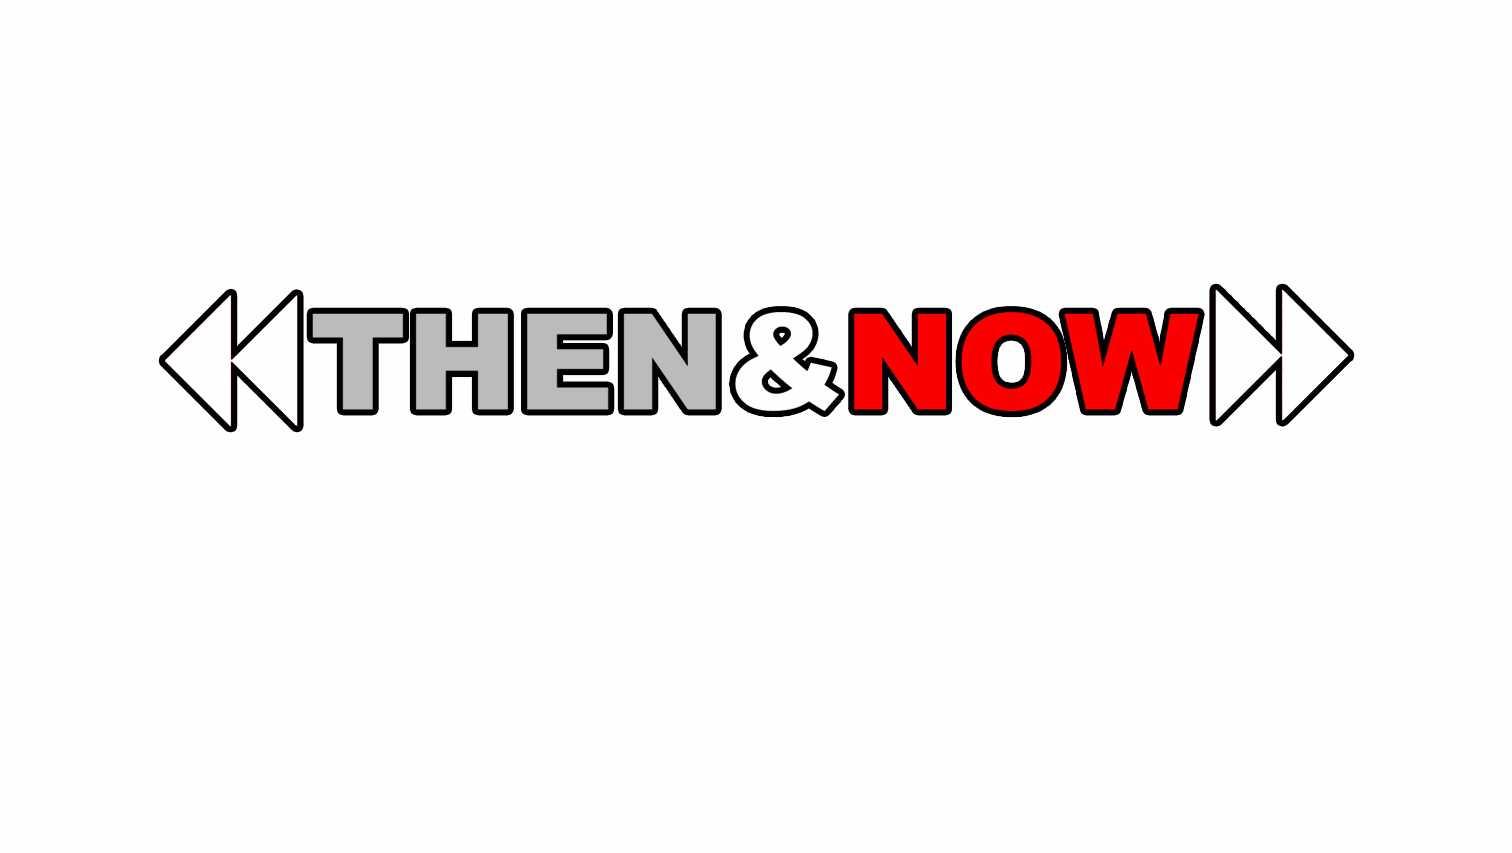 then & now_1528414936107.jpg.jpg